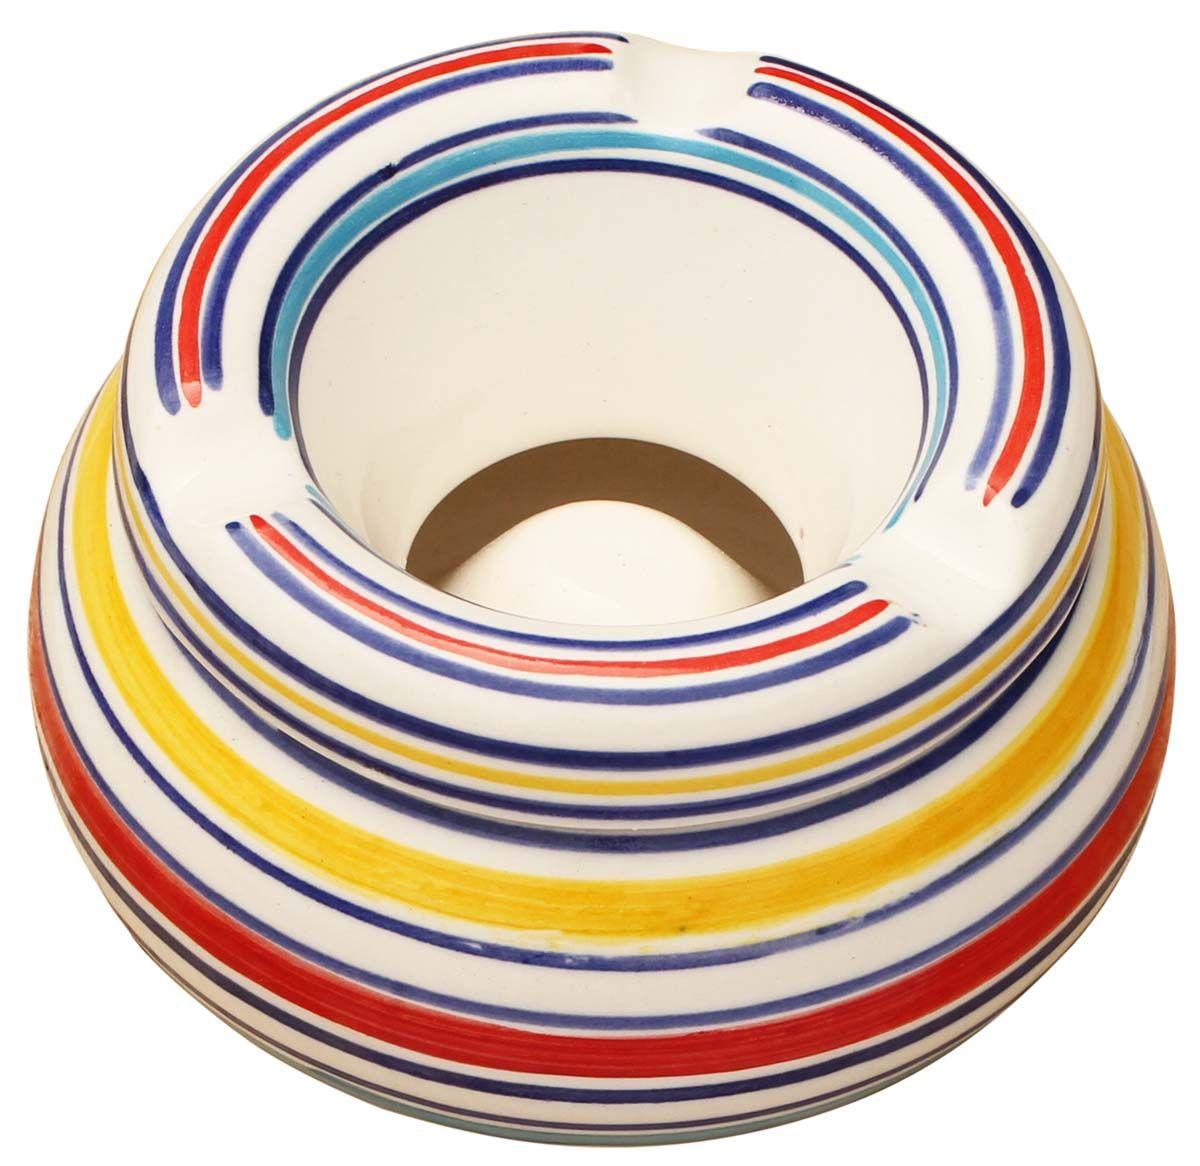 "Handmade Tray Decoration Impressive Circular Patterns  Handmade 46"" Ceramic Moroccan Style Ashtray Decorating Inspiration"